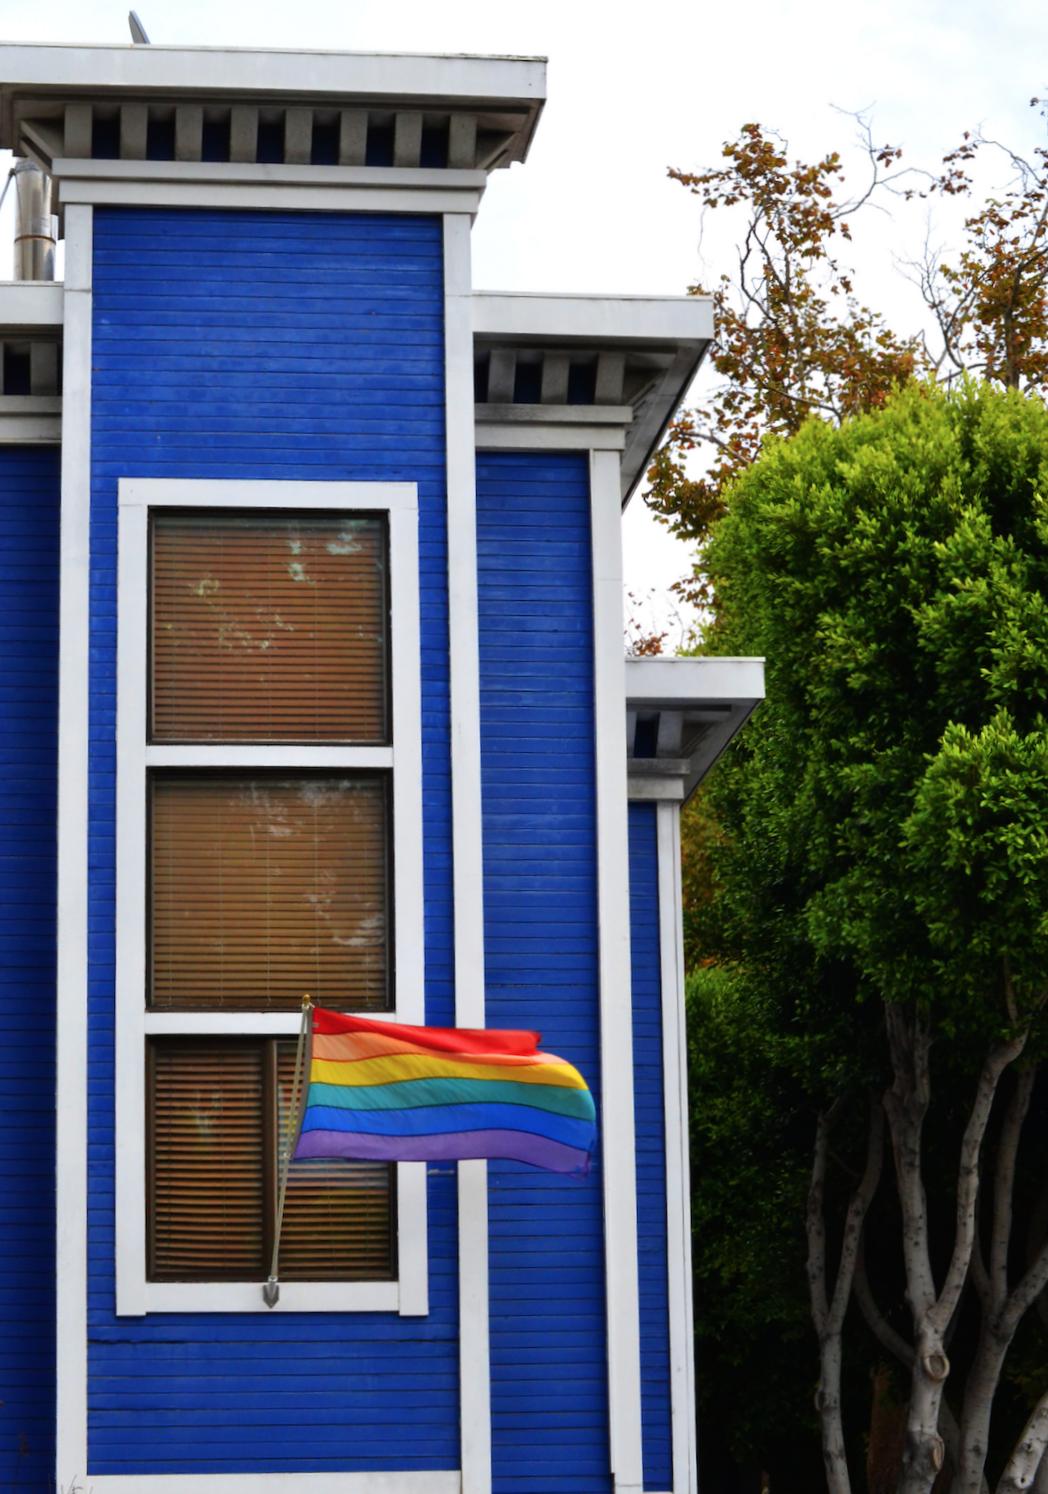 Aliana+Grace+Bailey+San+Francisco+California+Love+Wins+Gay+Pride.png